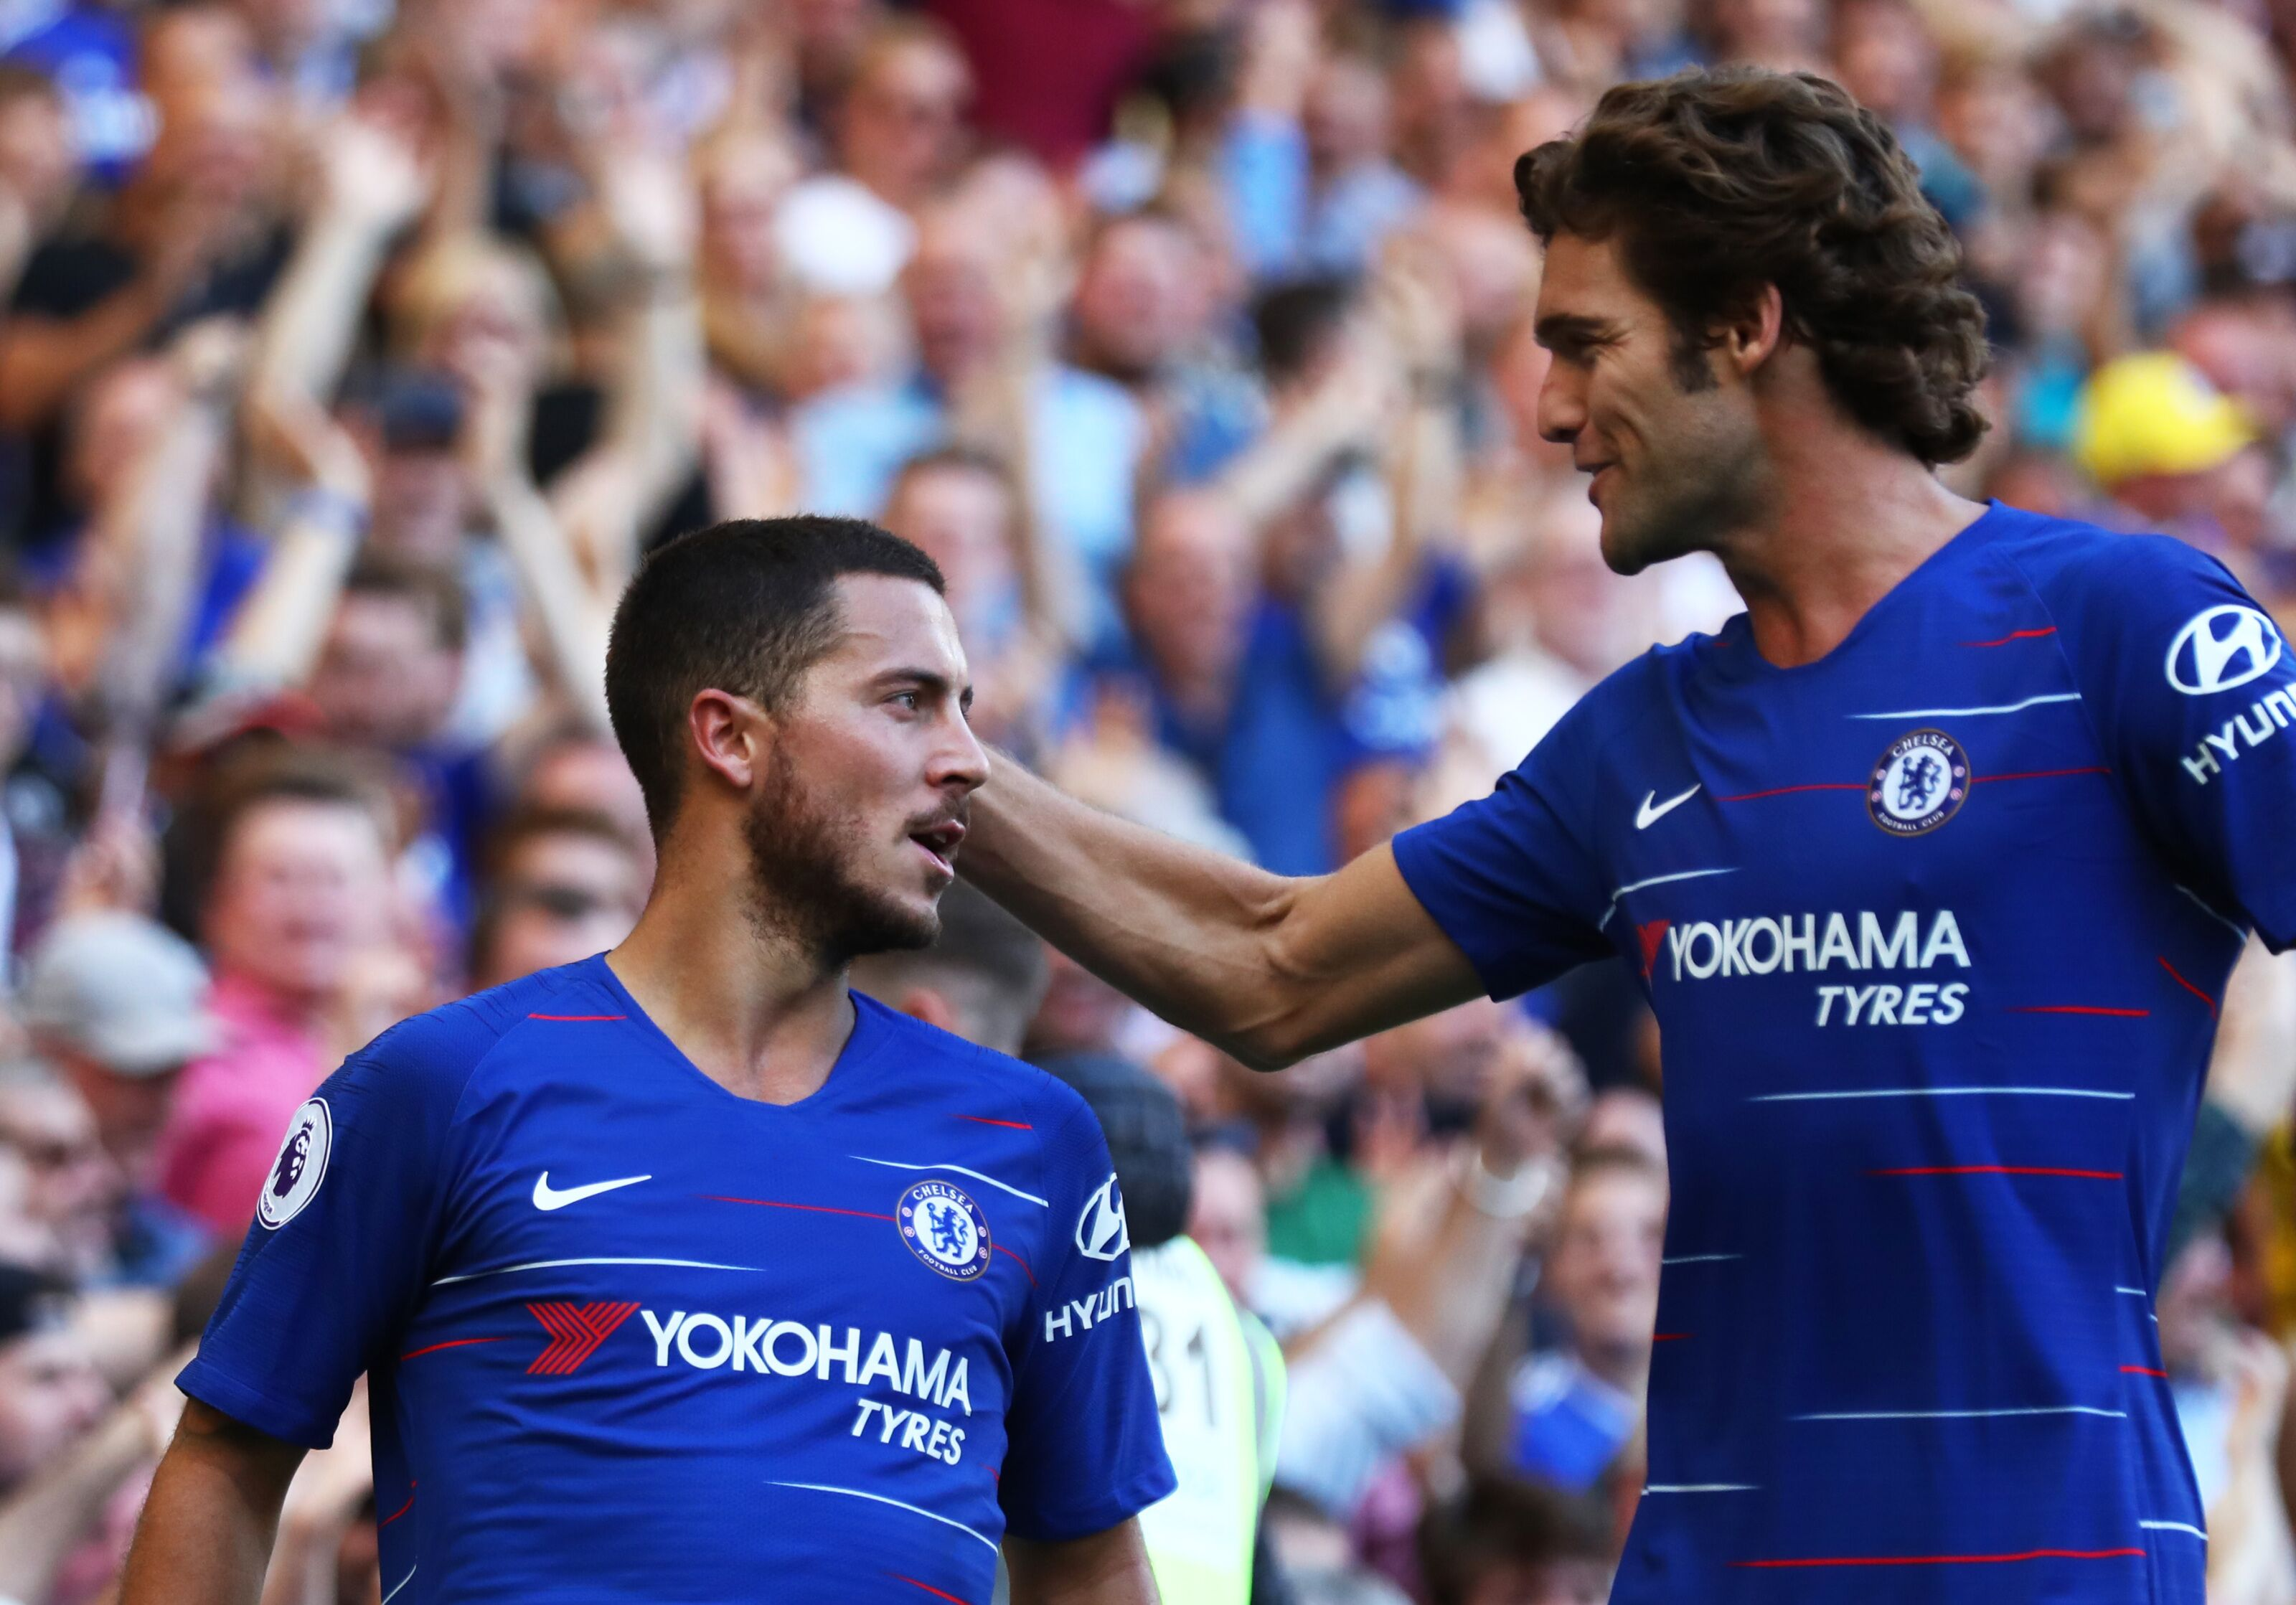 Chelsea predicted XI for Everton: Maurzio Sarri's best men - The Pride of London